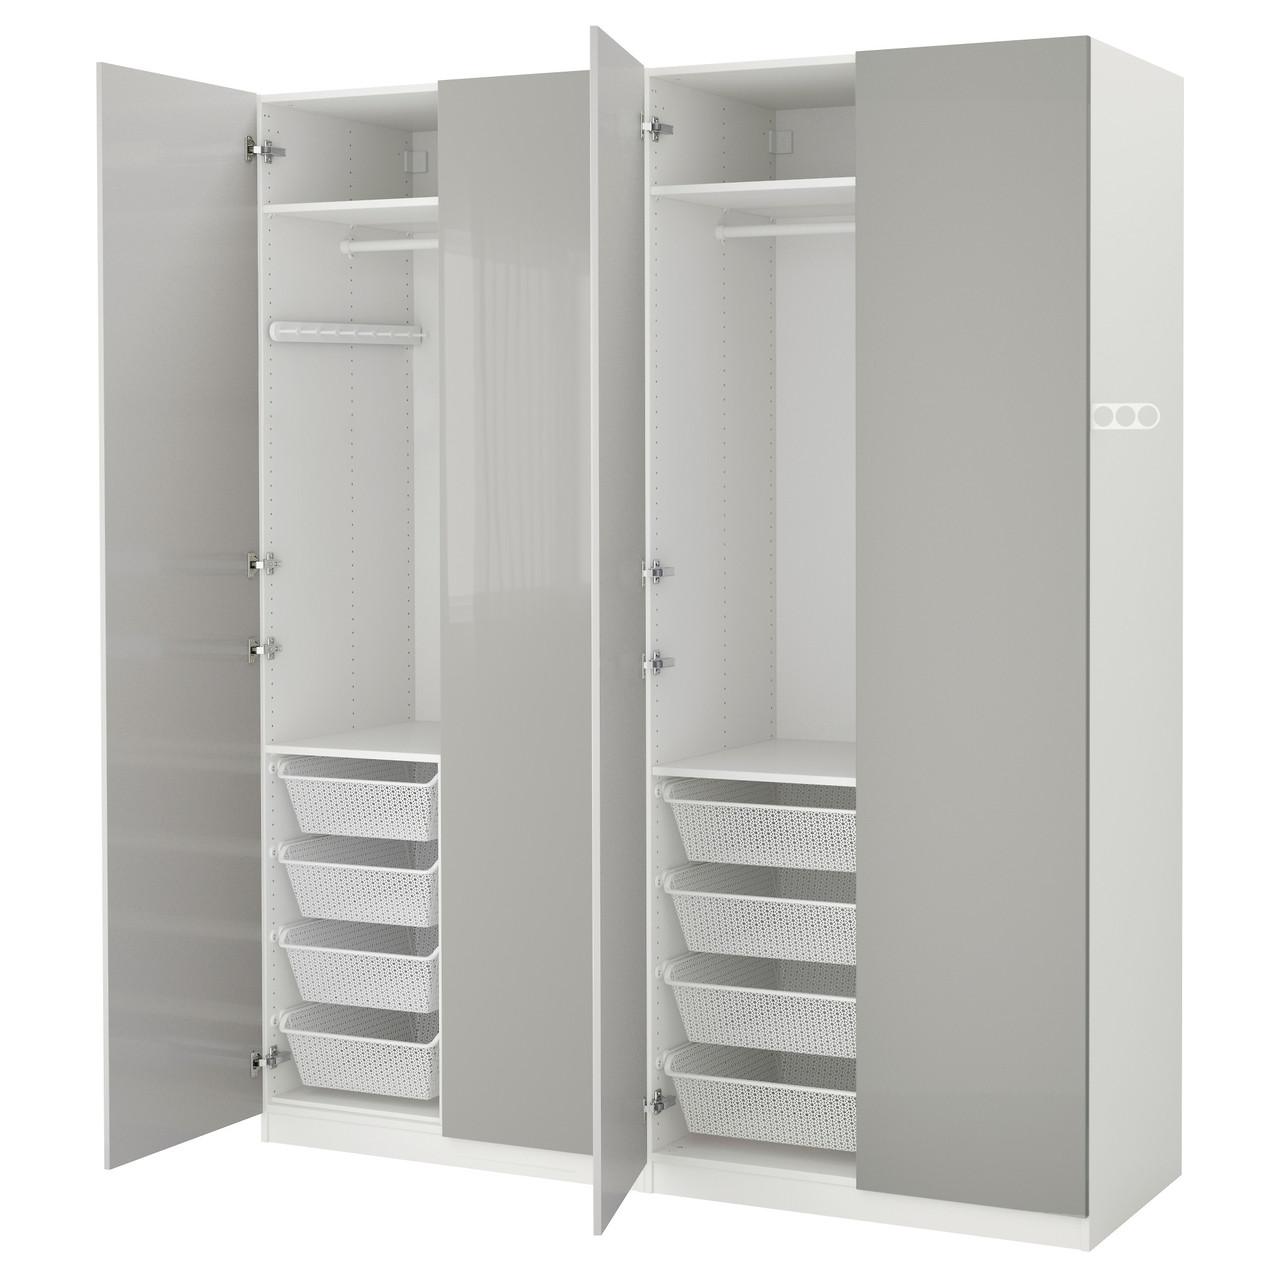 PAX Шкаф, белый, Fardal полированный светло-серый 491.793.36